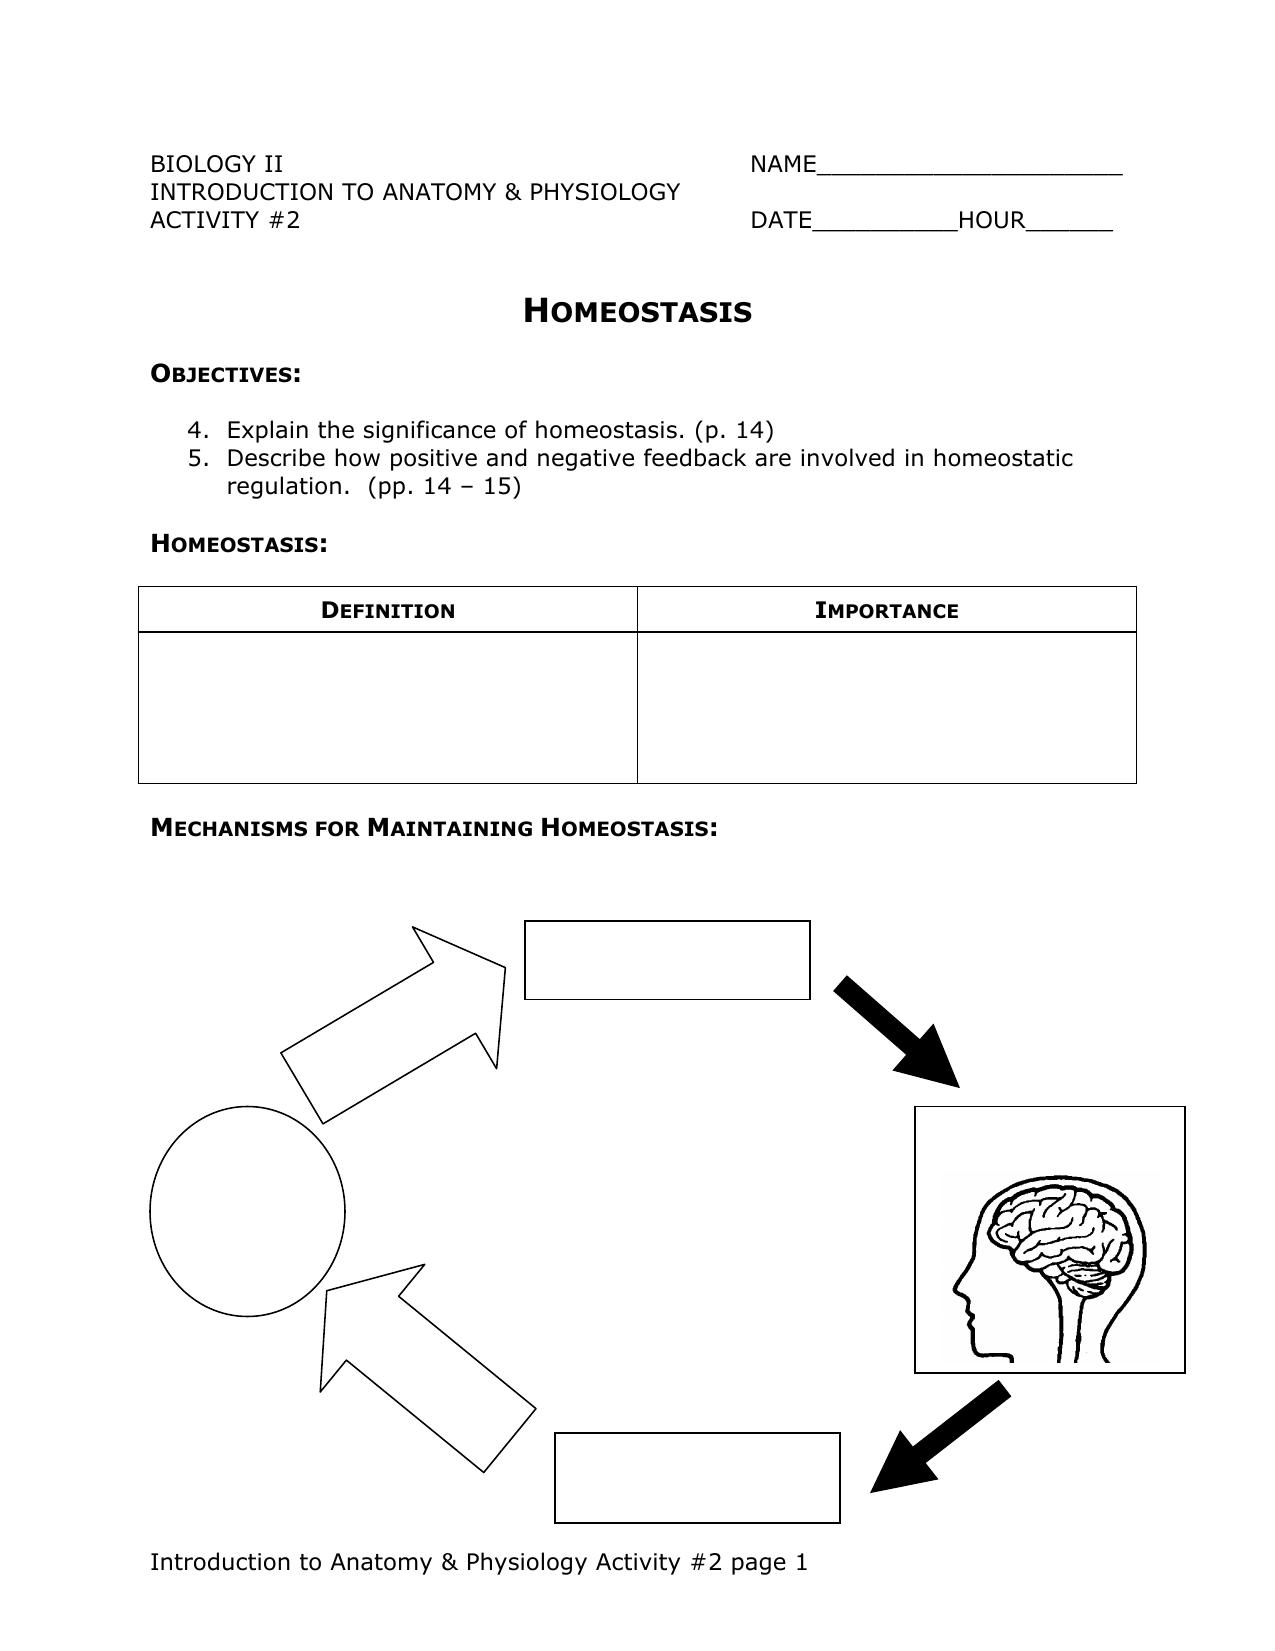 Negative Feedback Mechanism Anatomy Choice Image - human body anatomy